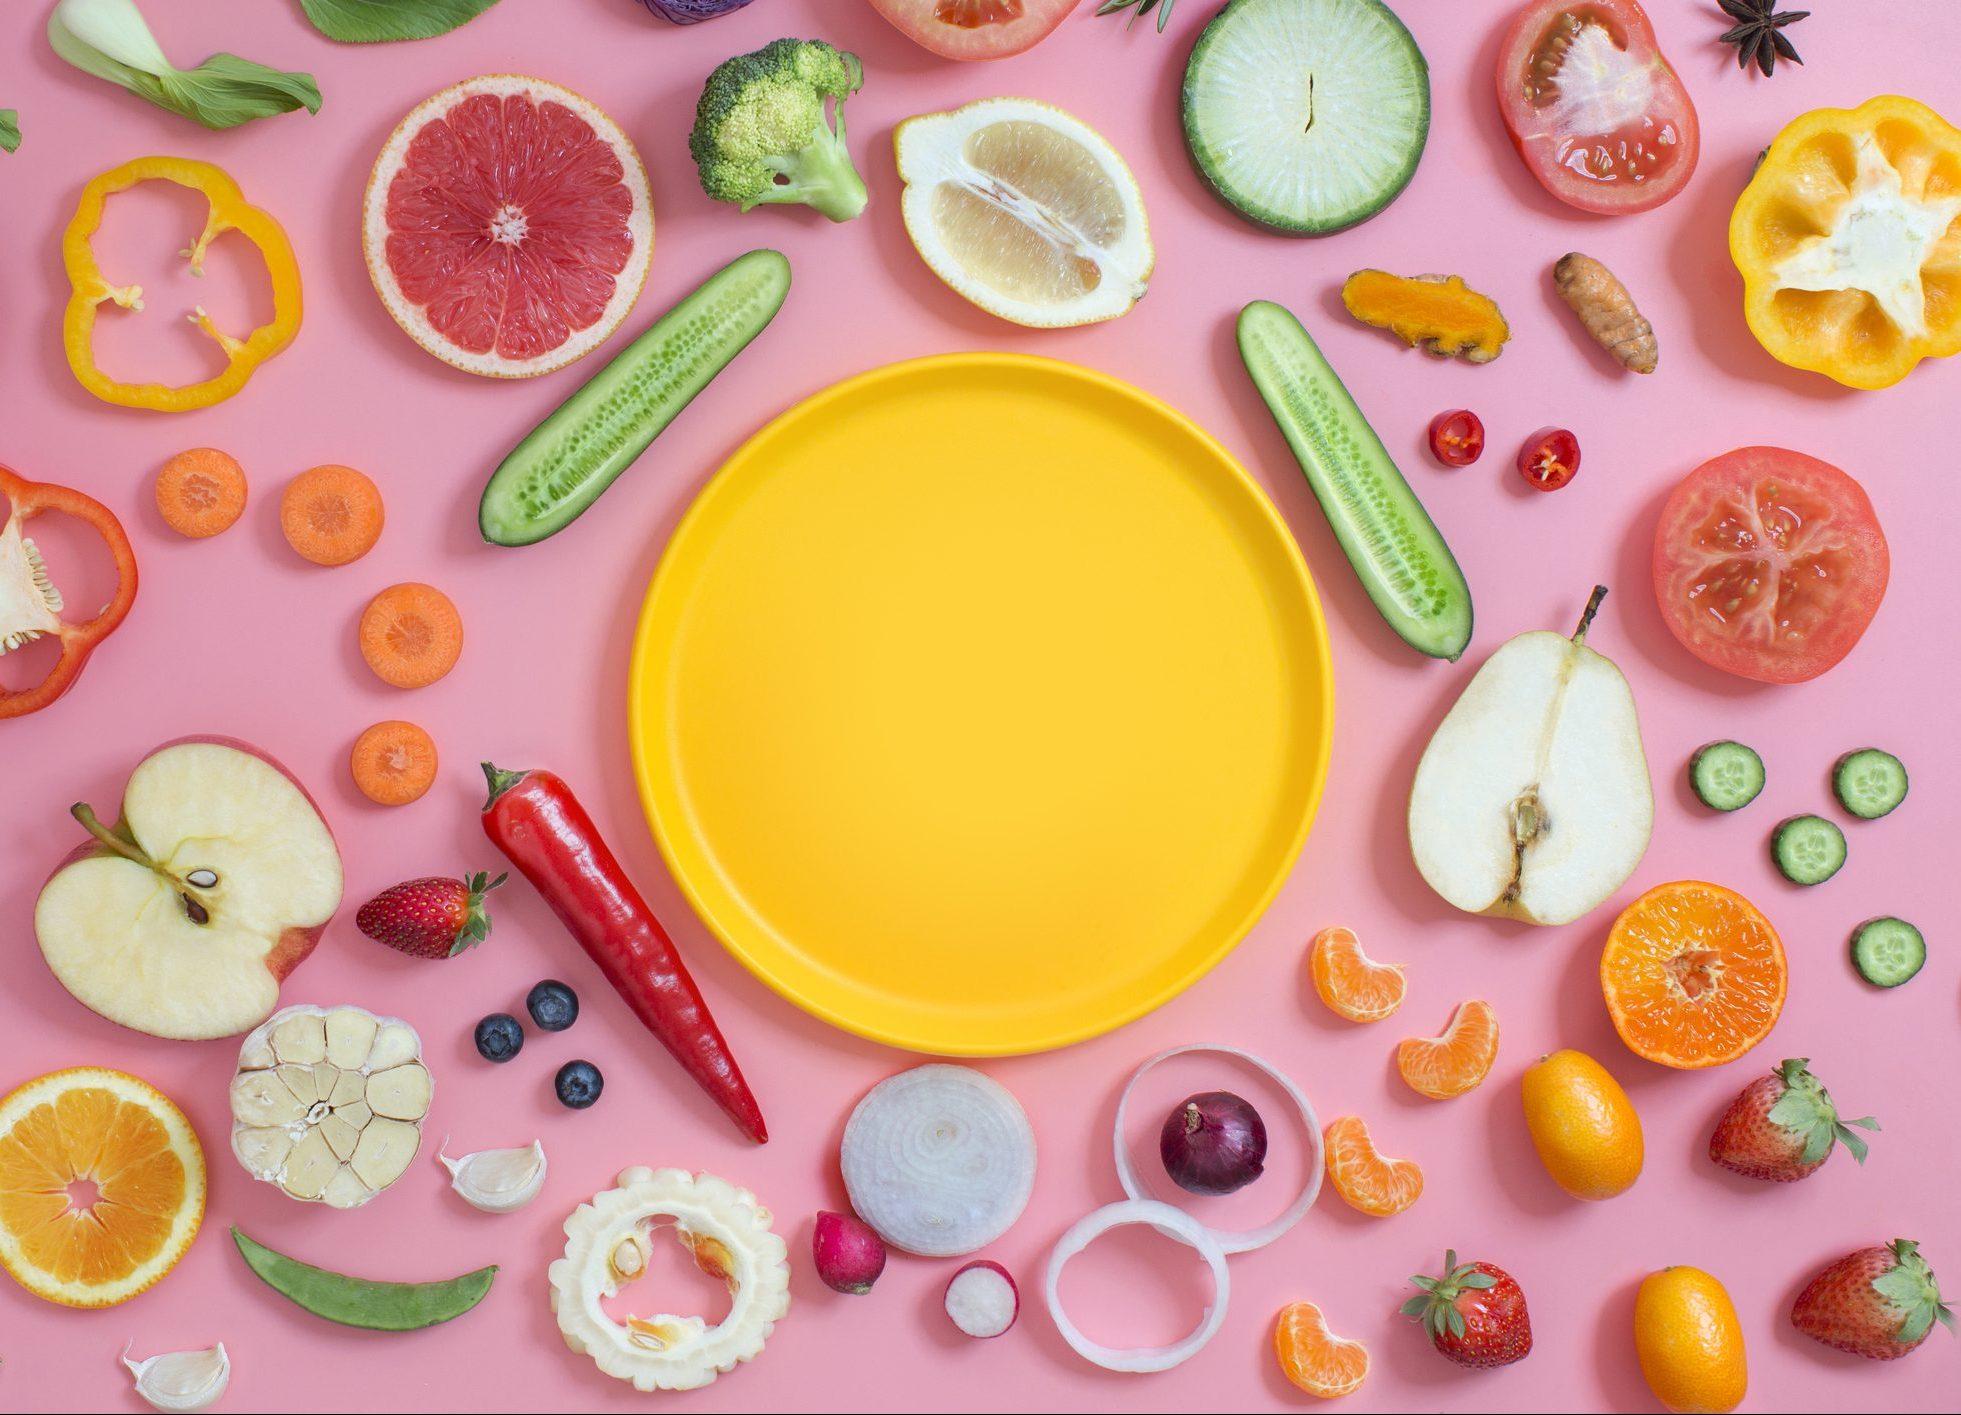 gettyimages-1176525416-e1597953414214 Prato colorido: Conheça a dieta da primavera e deixe seus pratos mais coloridos